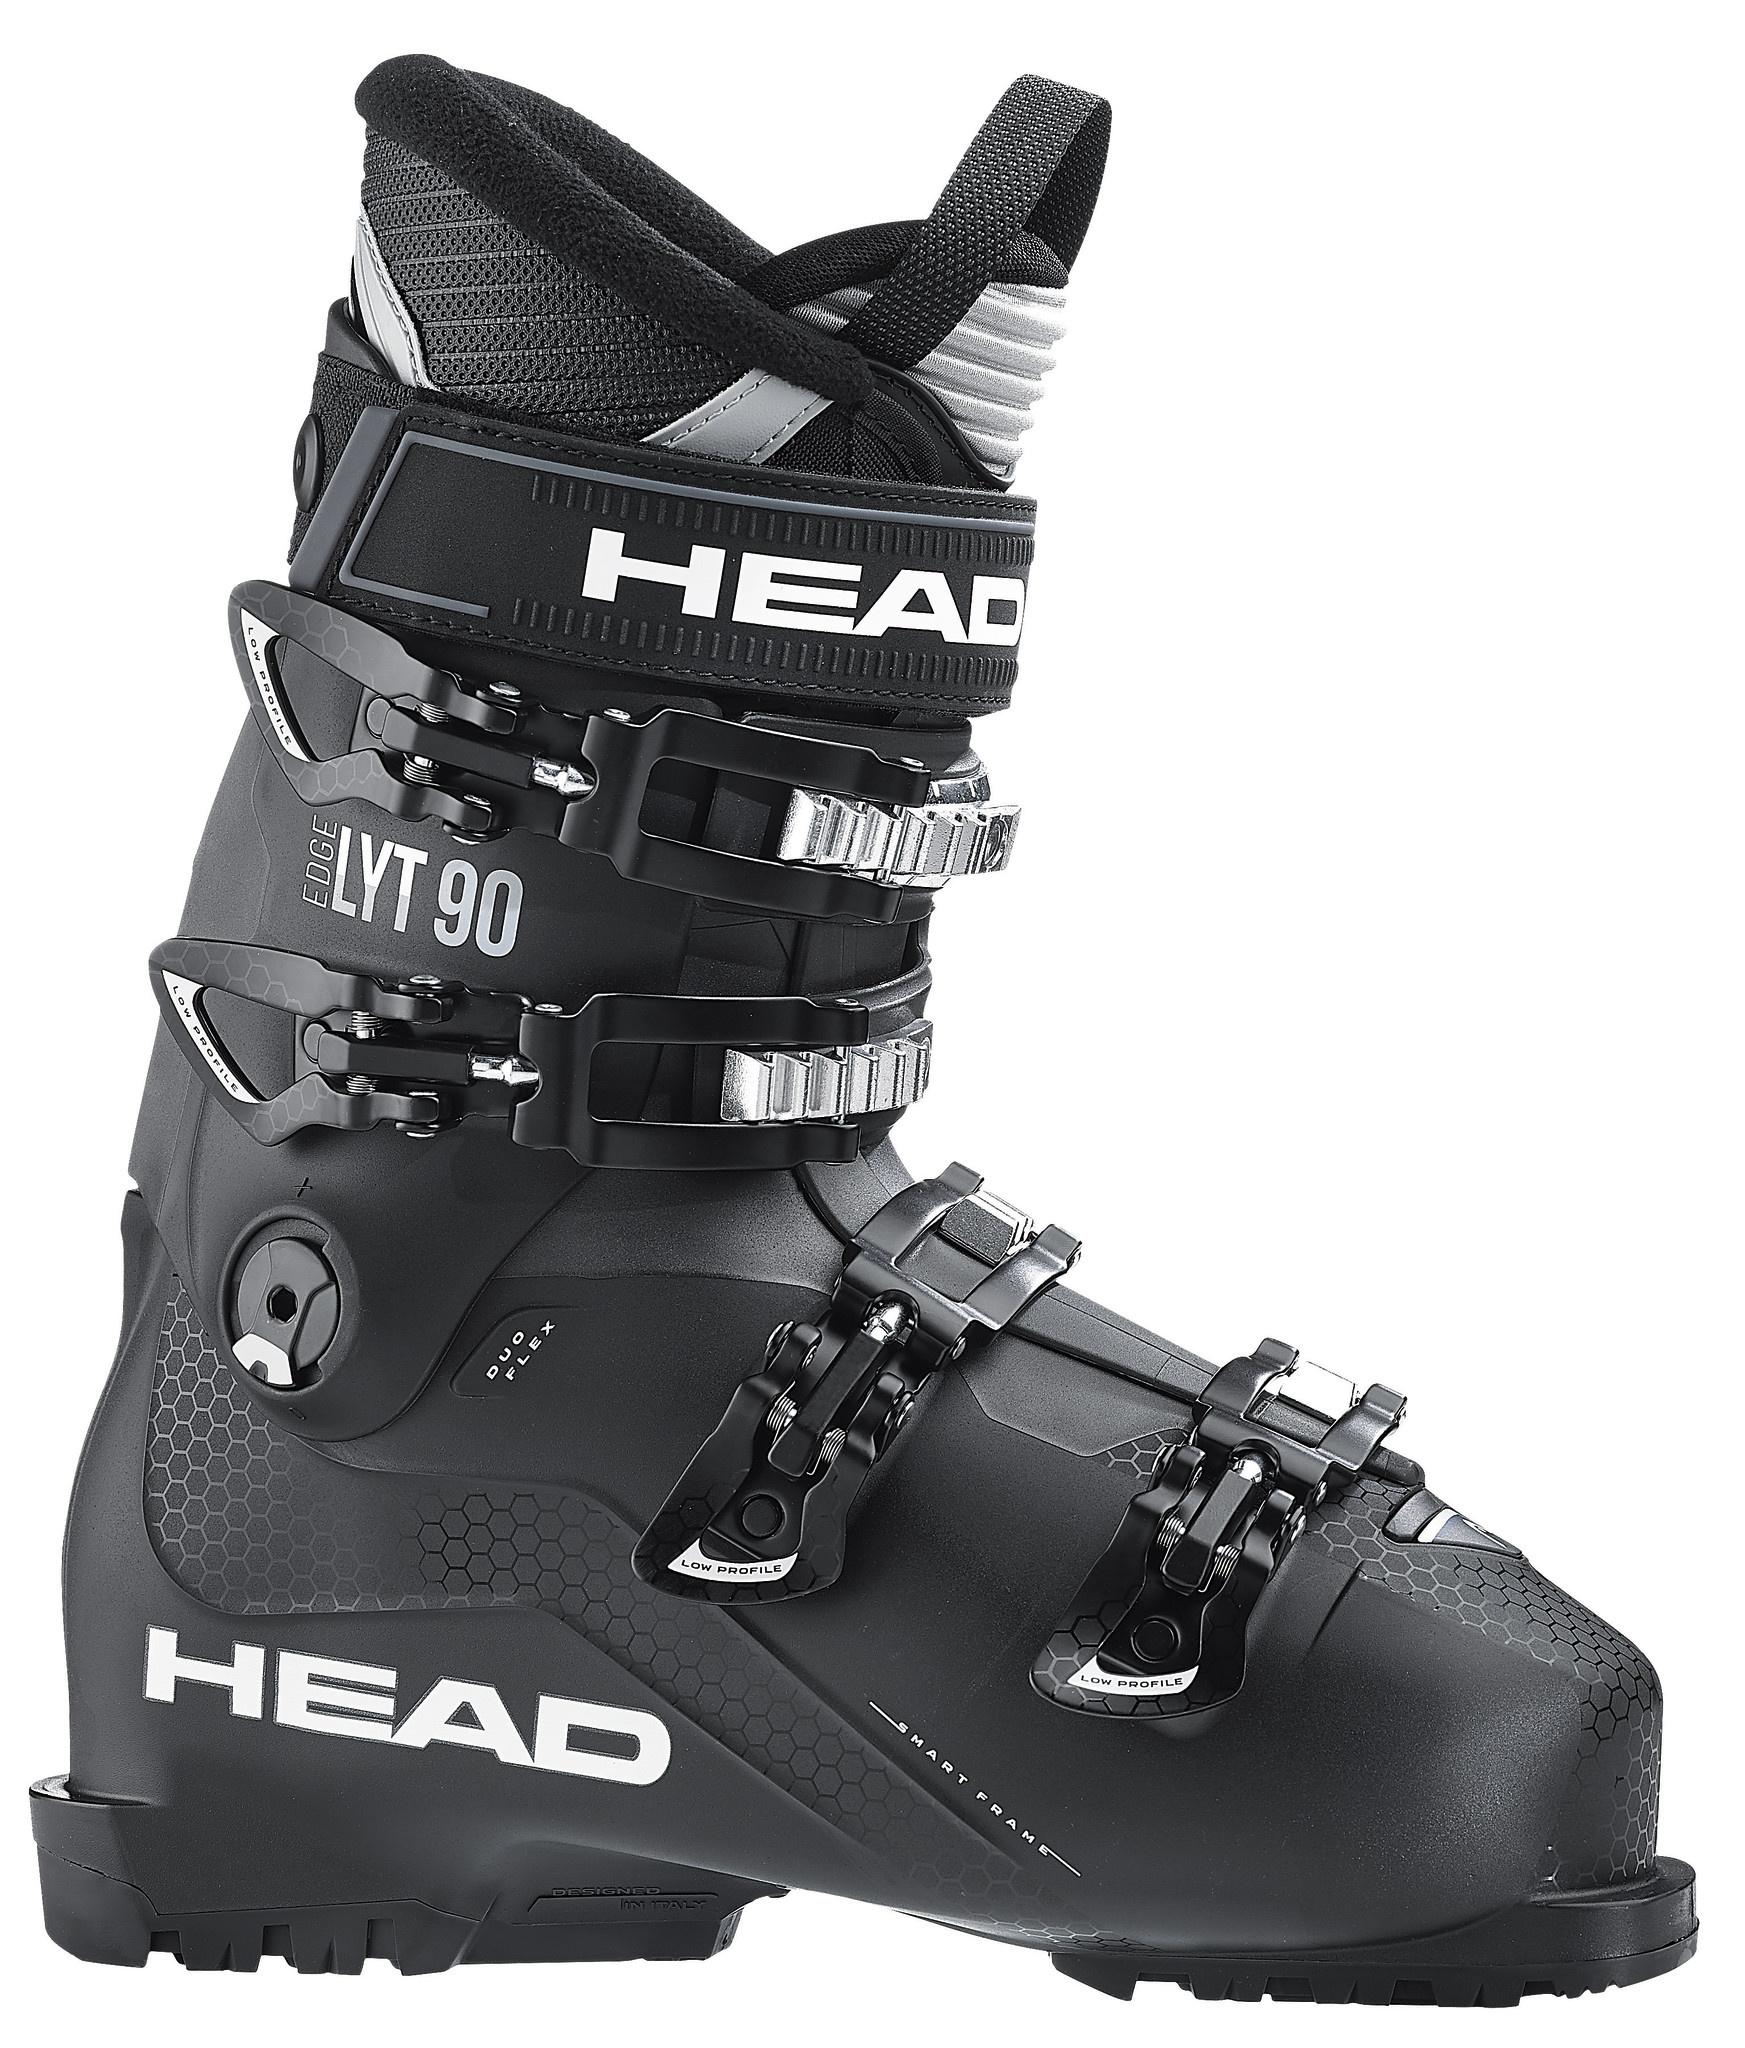 Head Head Men's Edge LYT 90 Ski Boot (2021)